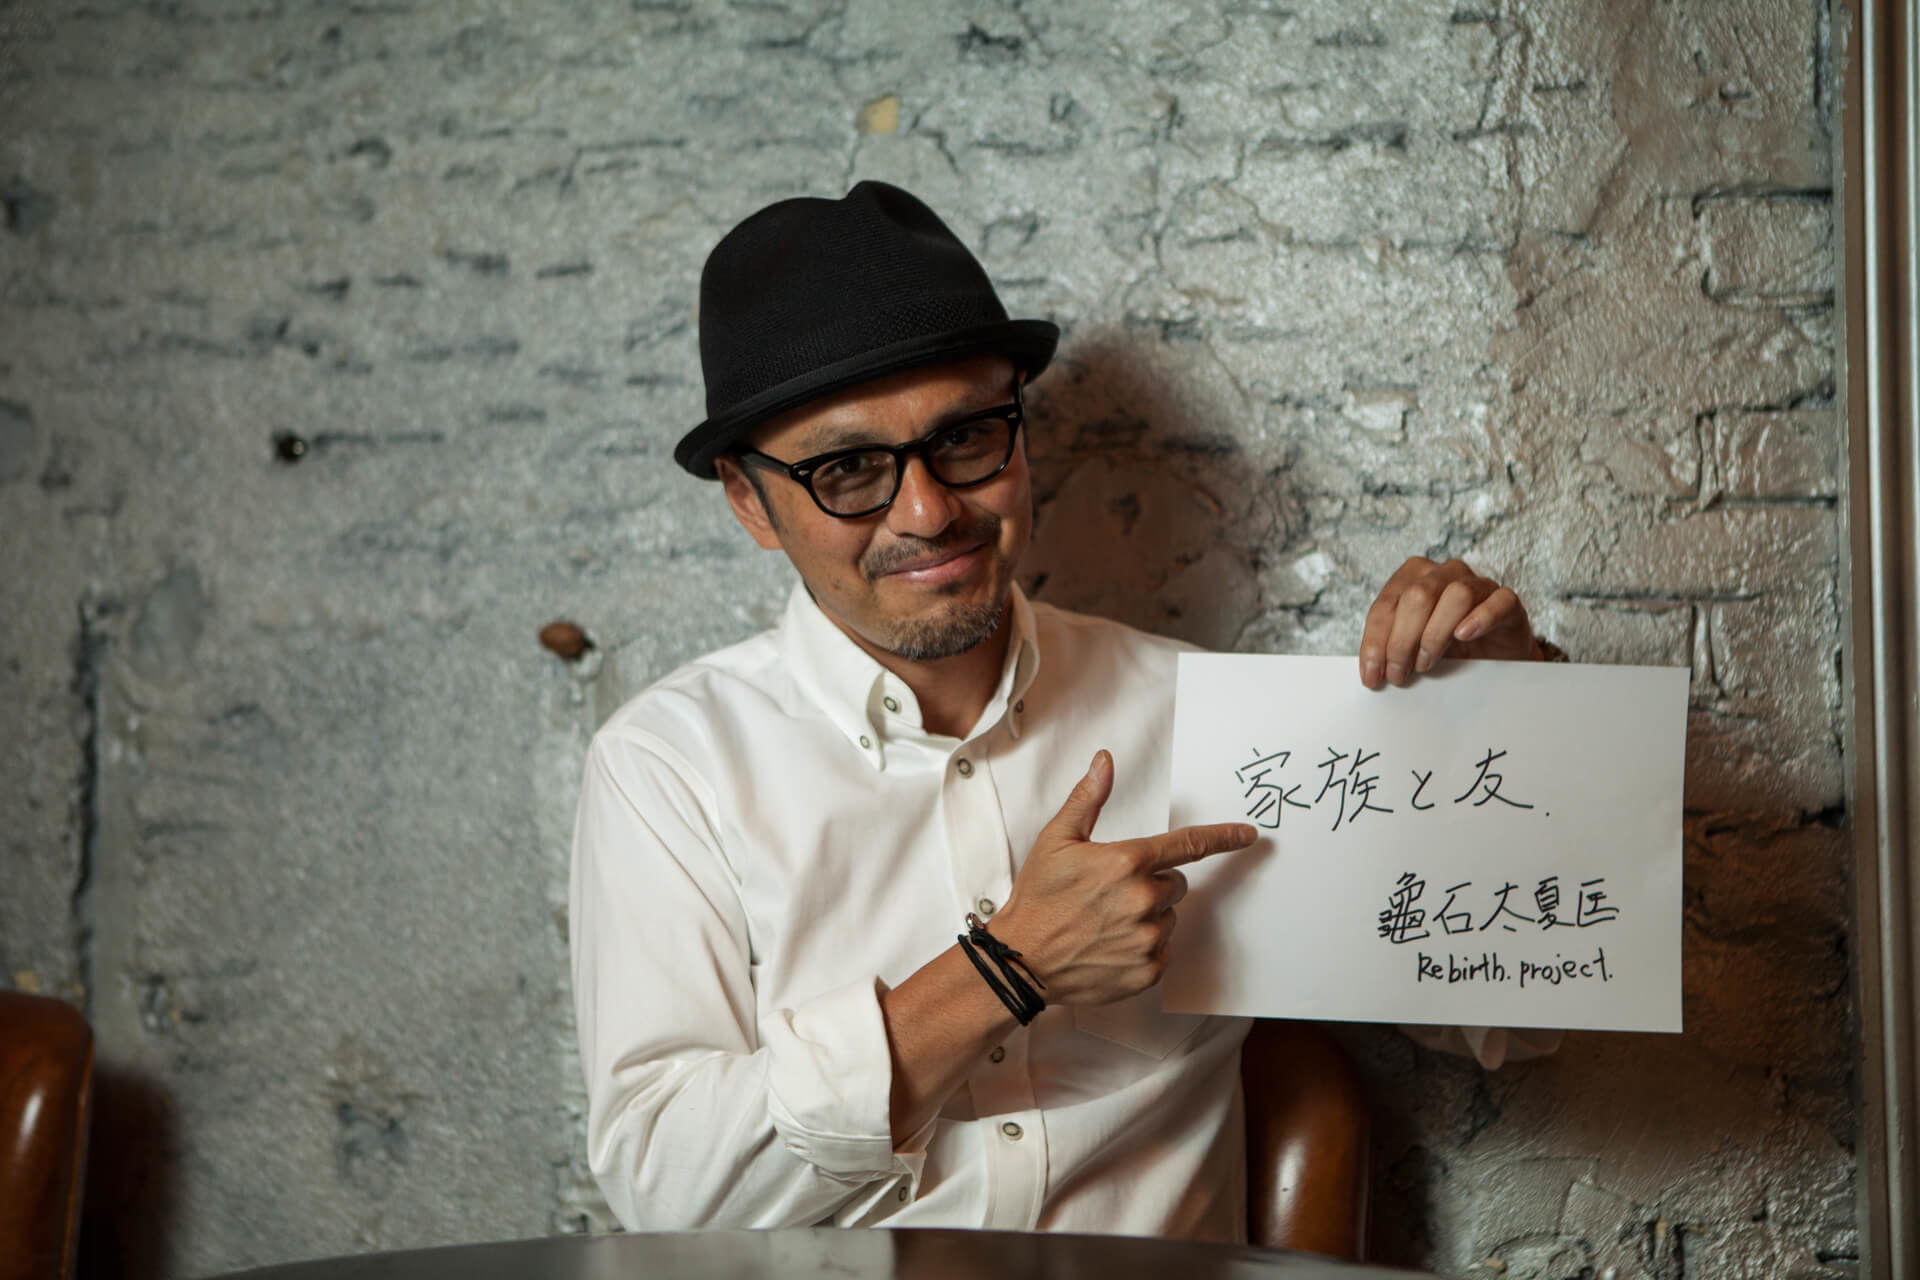 160321_beinspired-kameishi_11